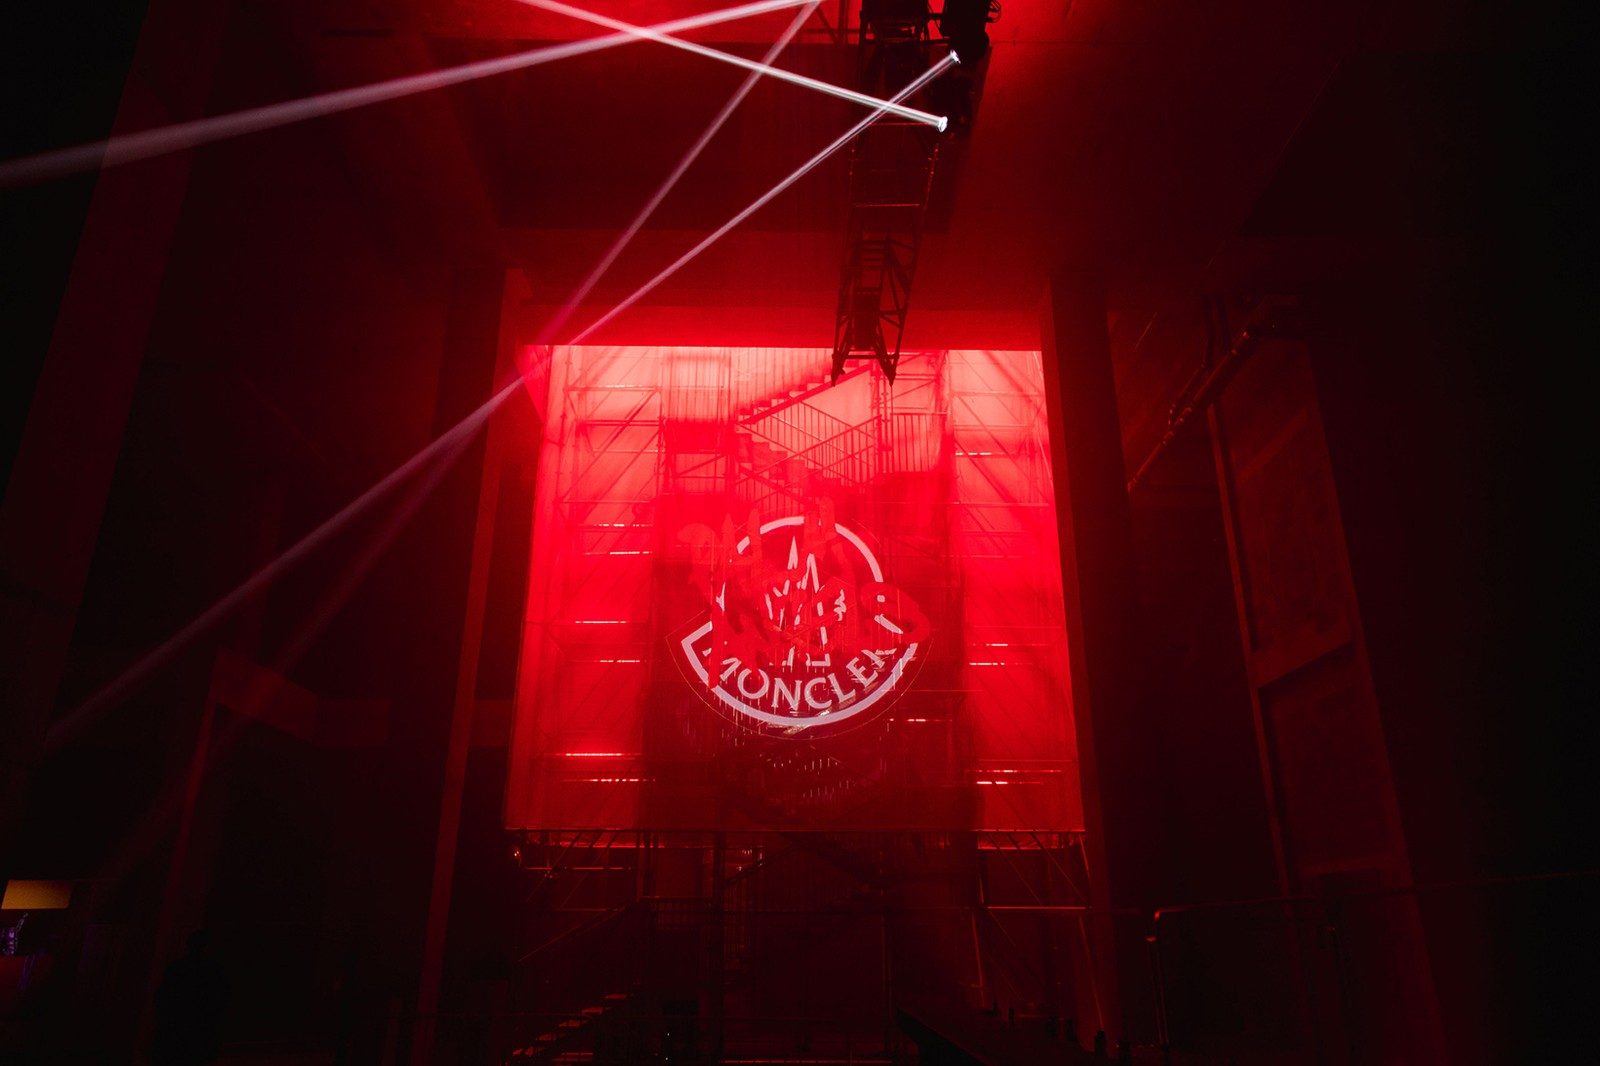 Moncler Genius AW 2019 Palm Angels Francesco Ragazzi Interview Octavian Rapper Performance Collection